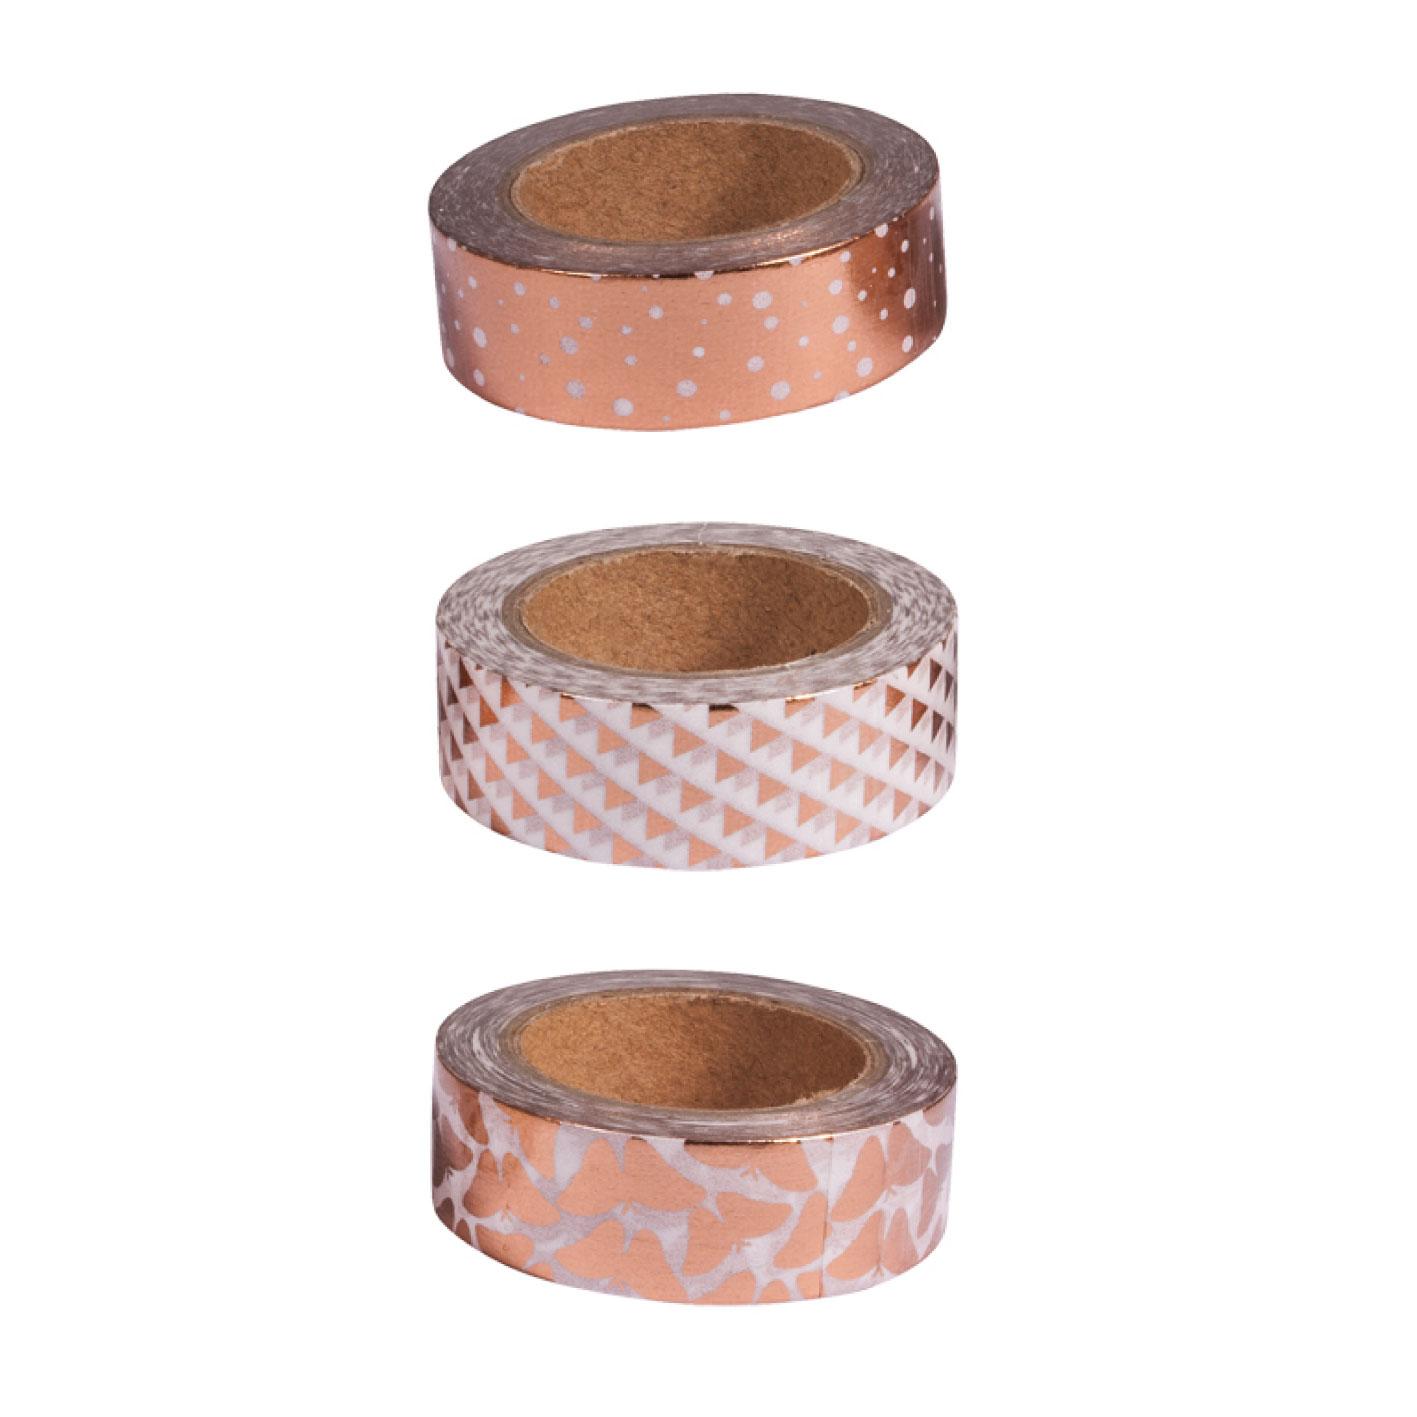 Kit 3 washi tape blanco, rosa y oro foil. 15mmx10m